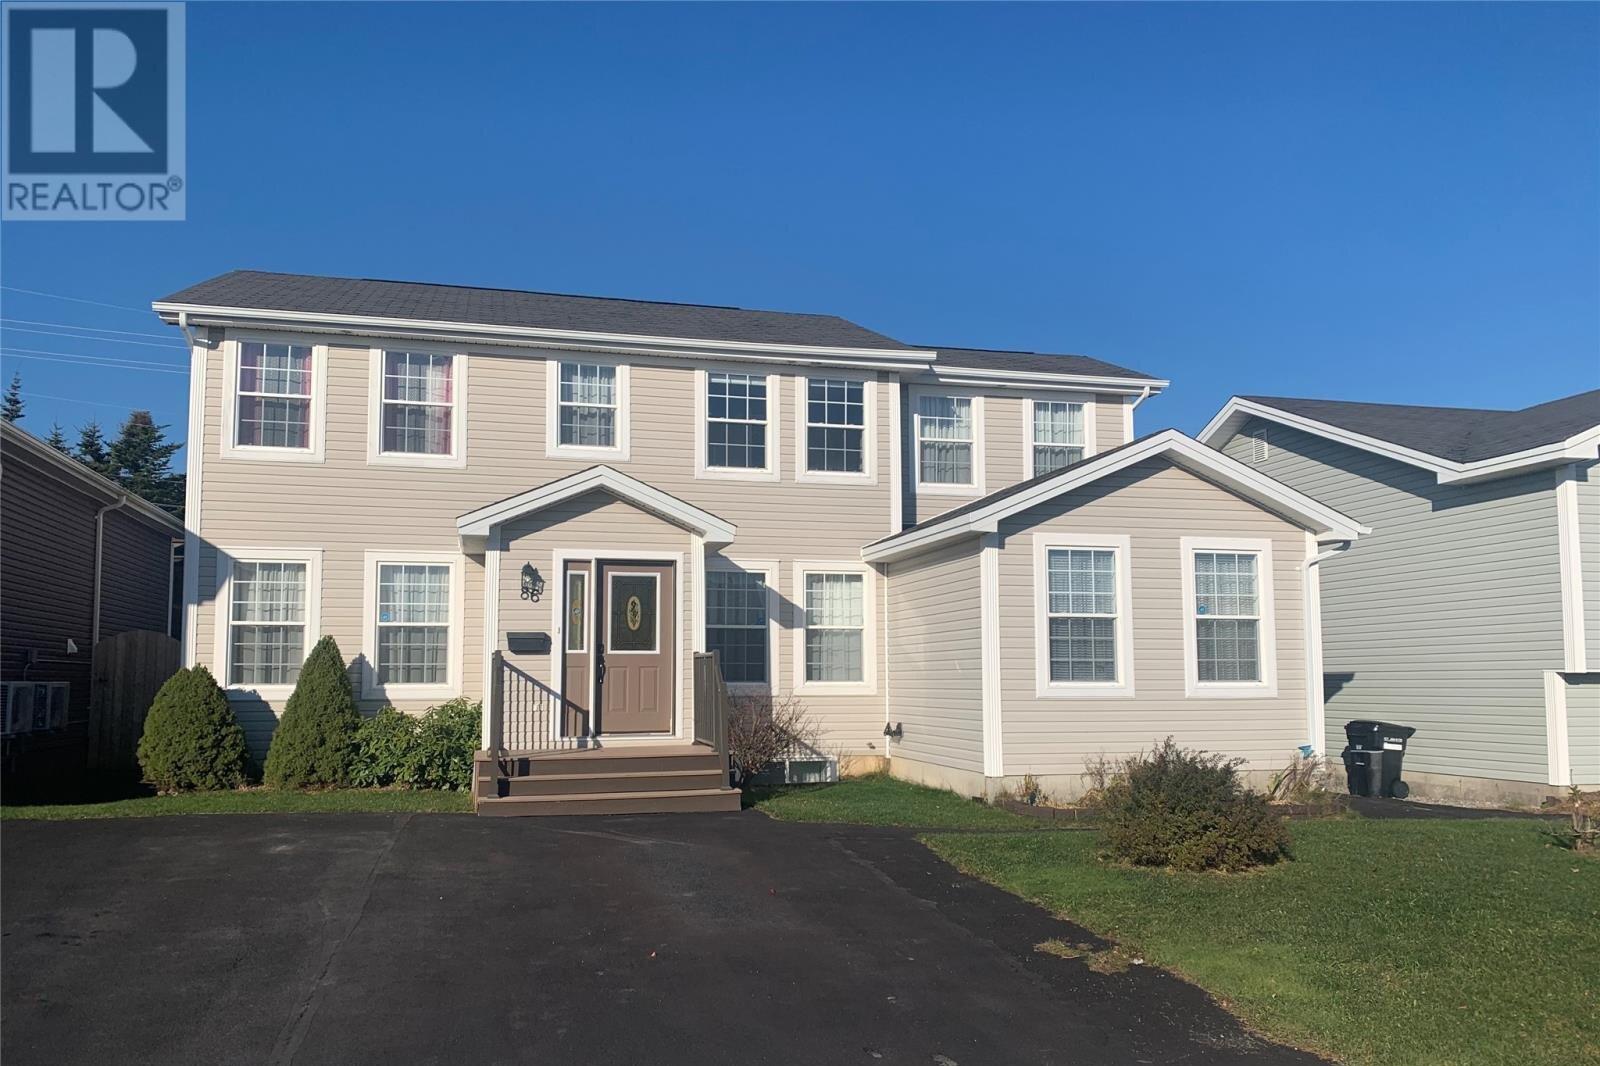 House for sale at 86 Eastbourne Cres St. John's Newfoundland - MLS: 1223742